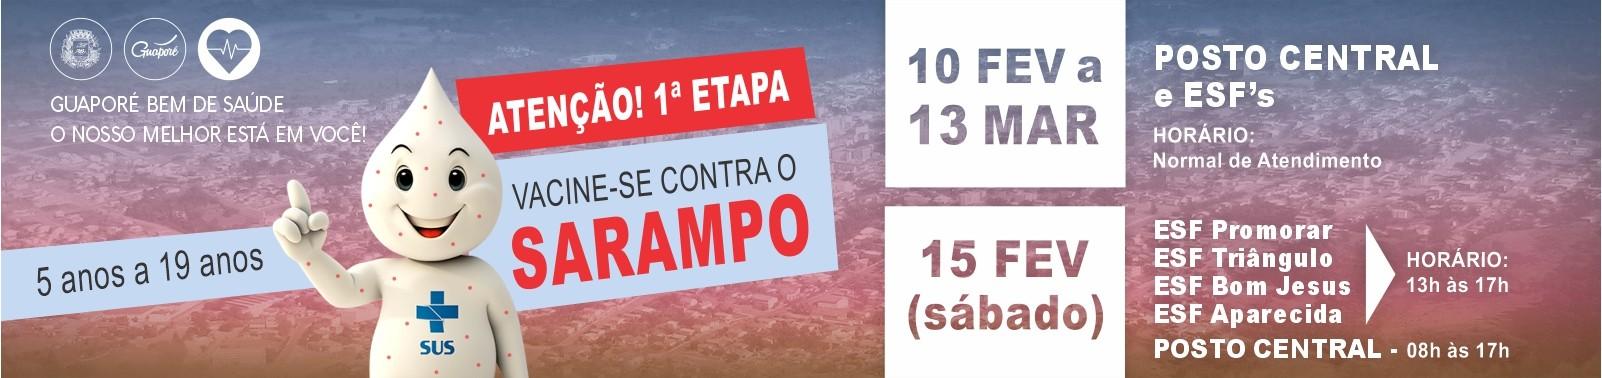 Banner 3 - Vacina Sarampo